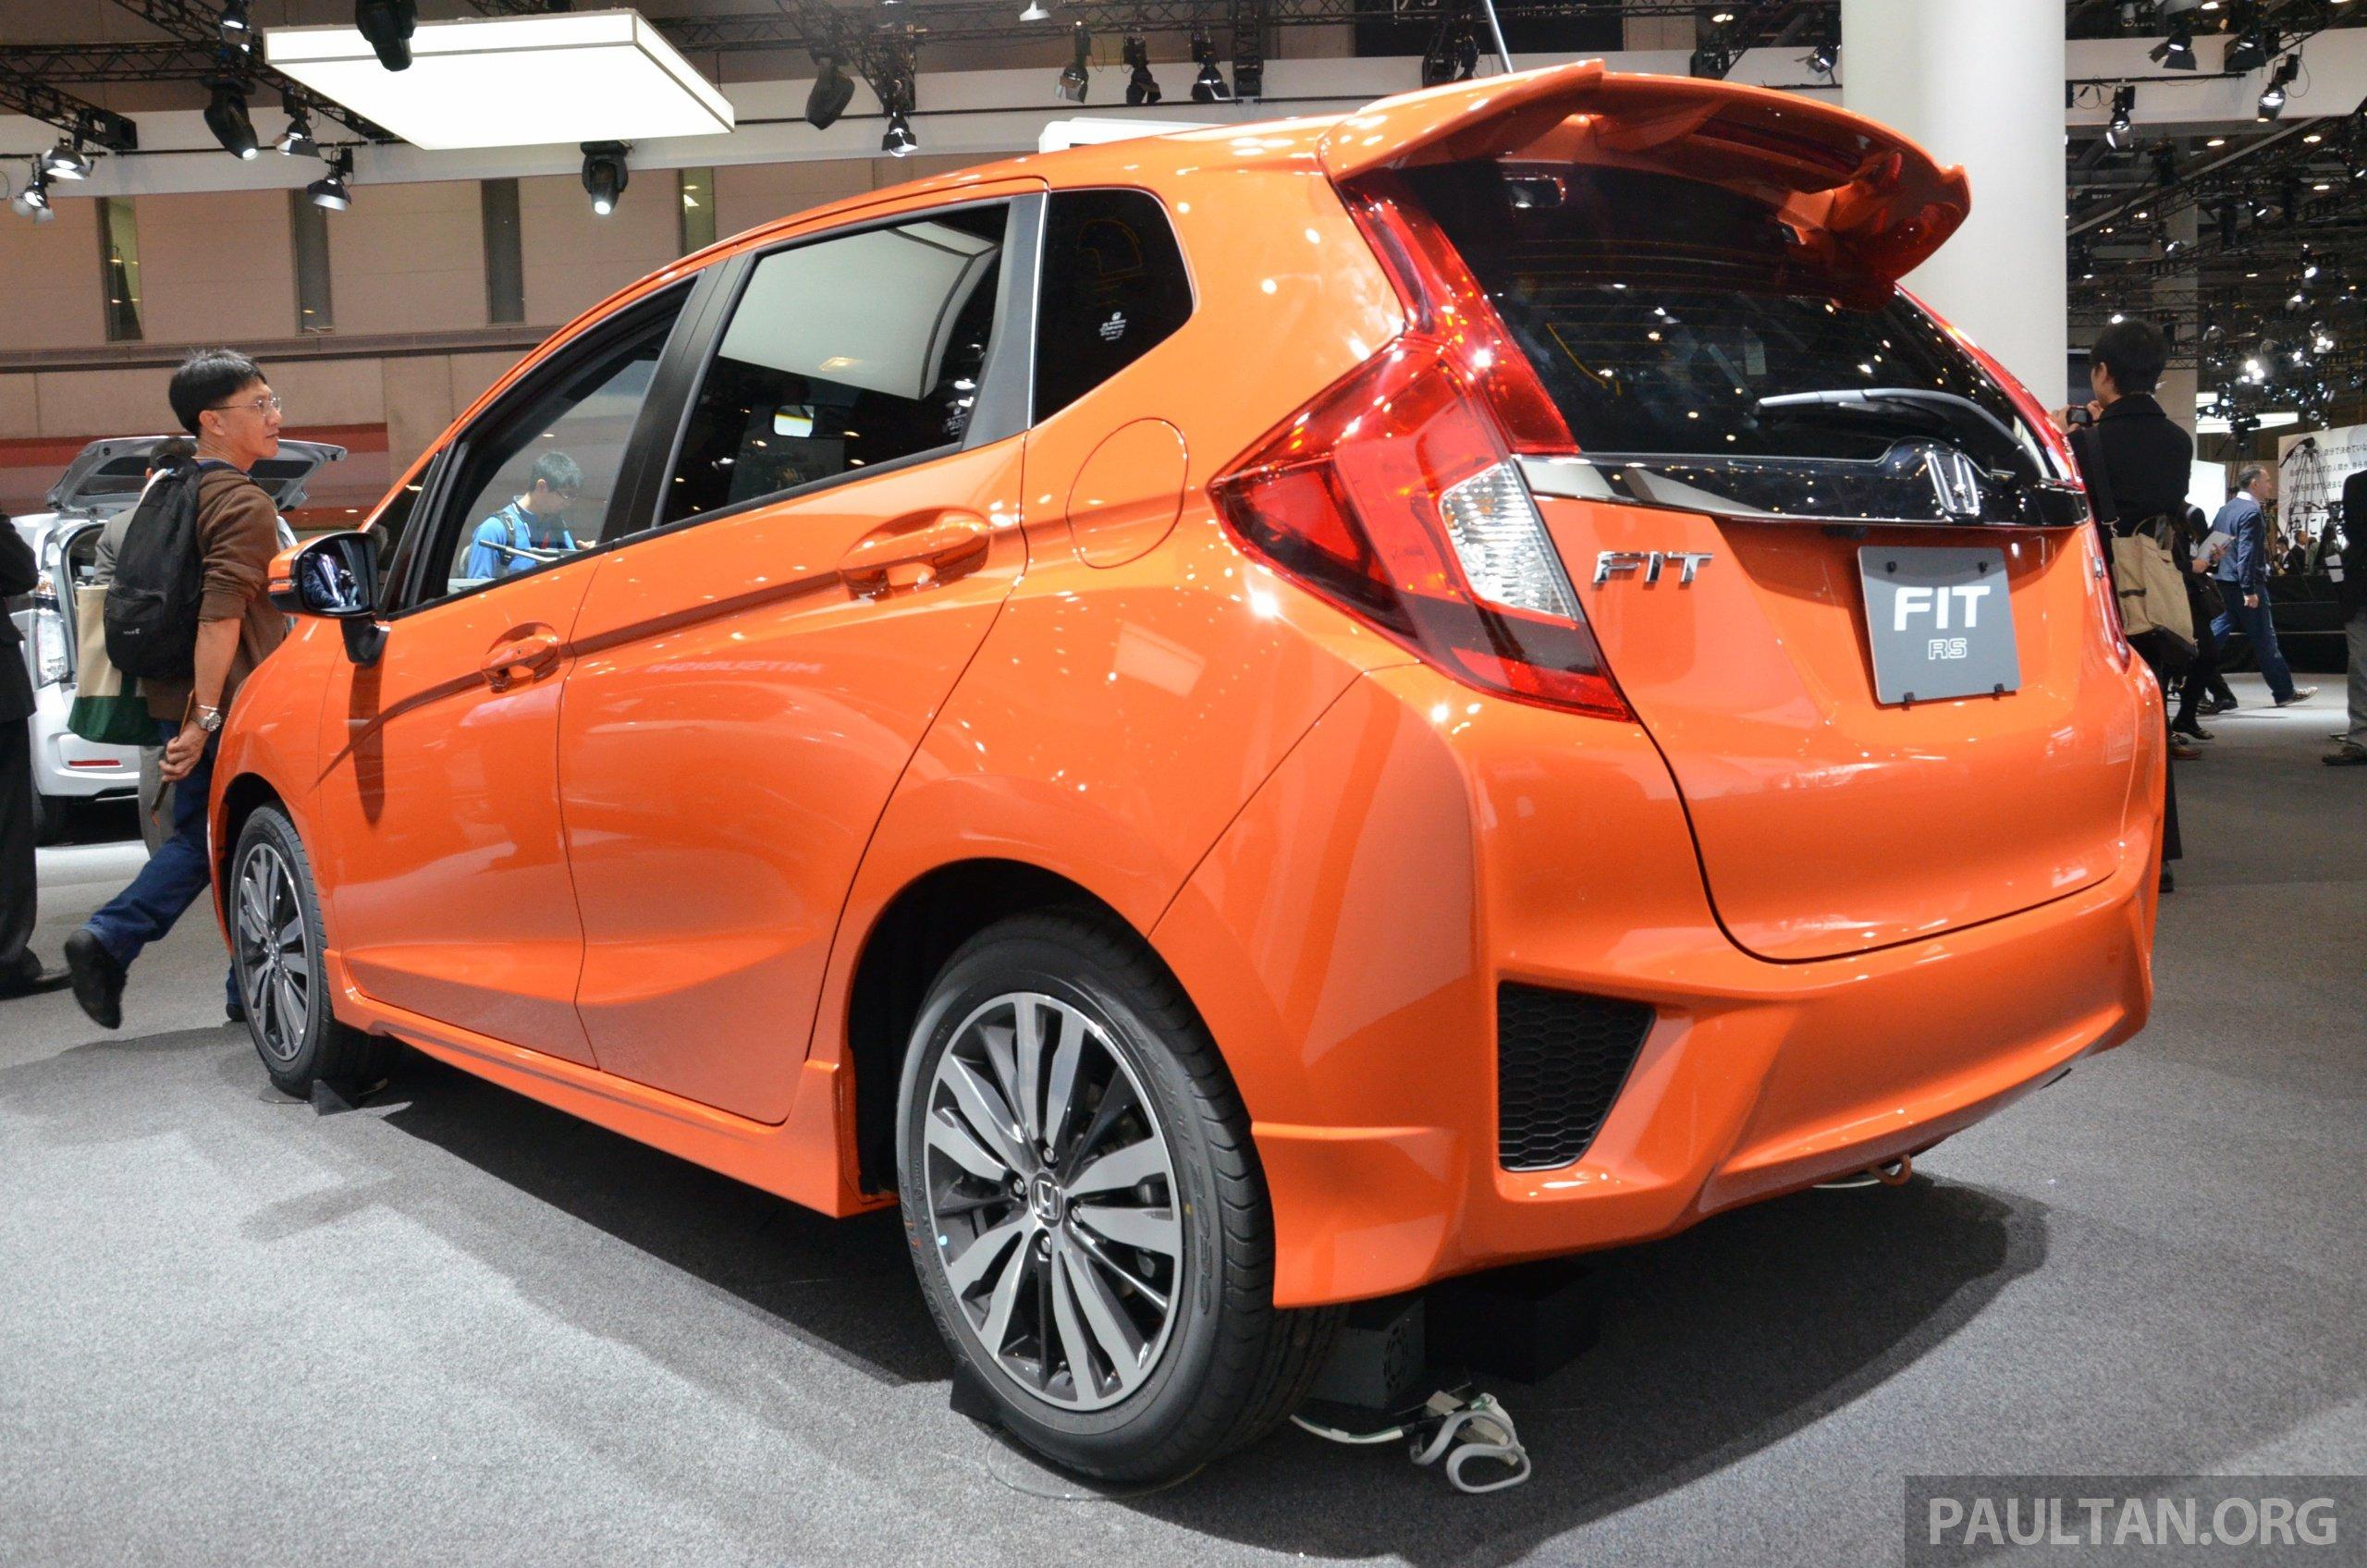 Tokyo 2013: Honda Fit (Jazz) RS looking good